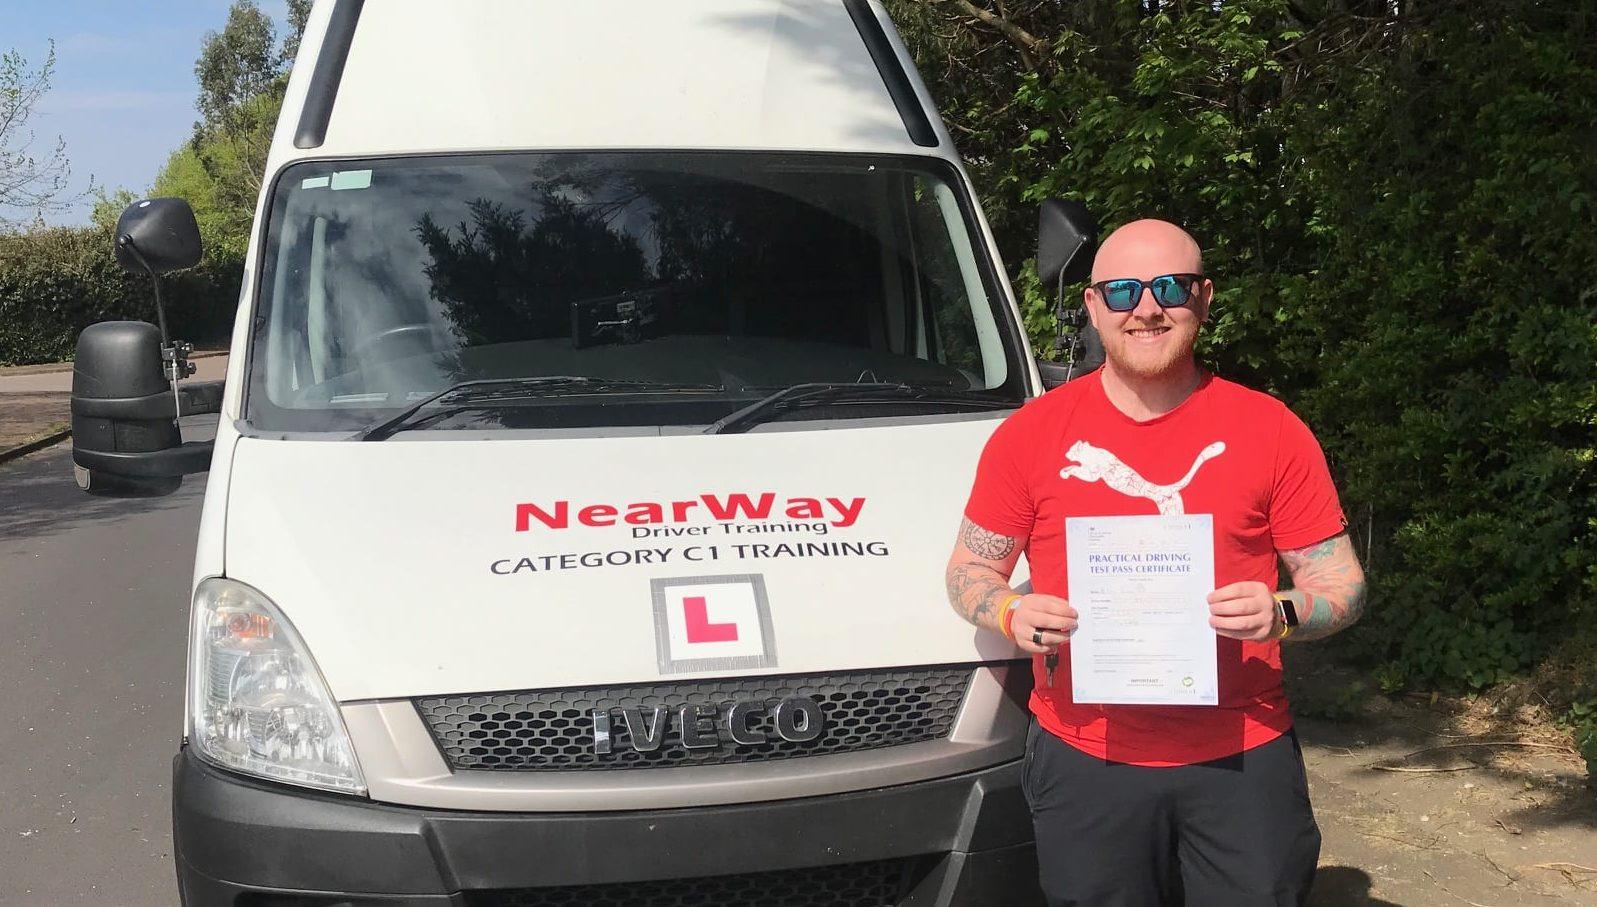 Ambulance driving test Craig Booth